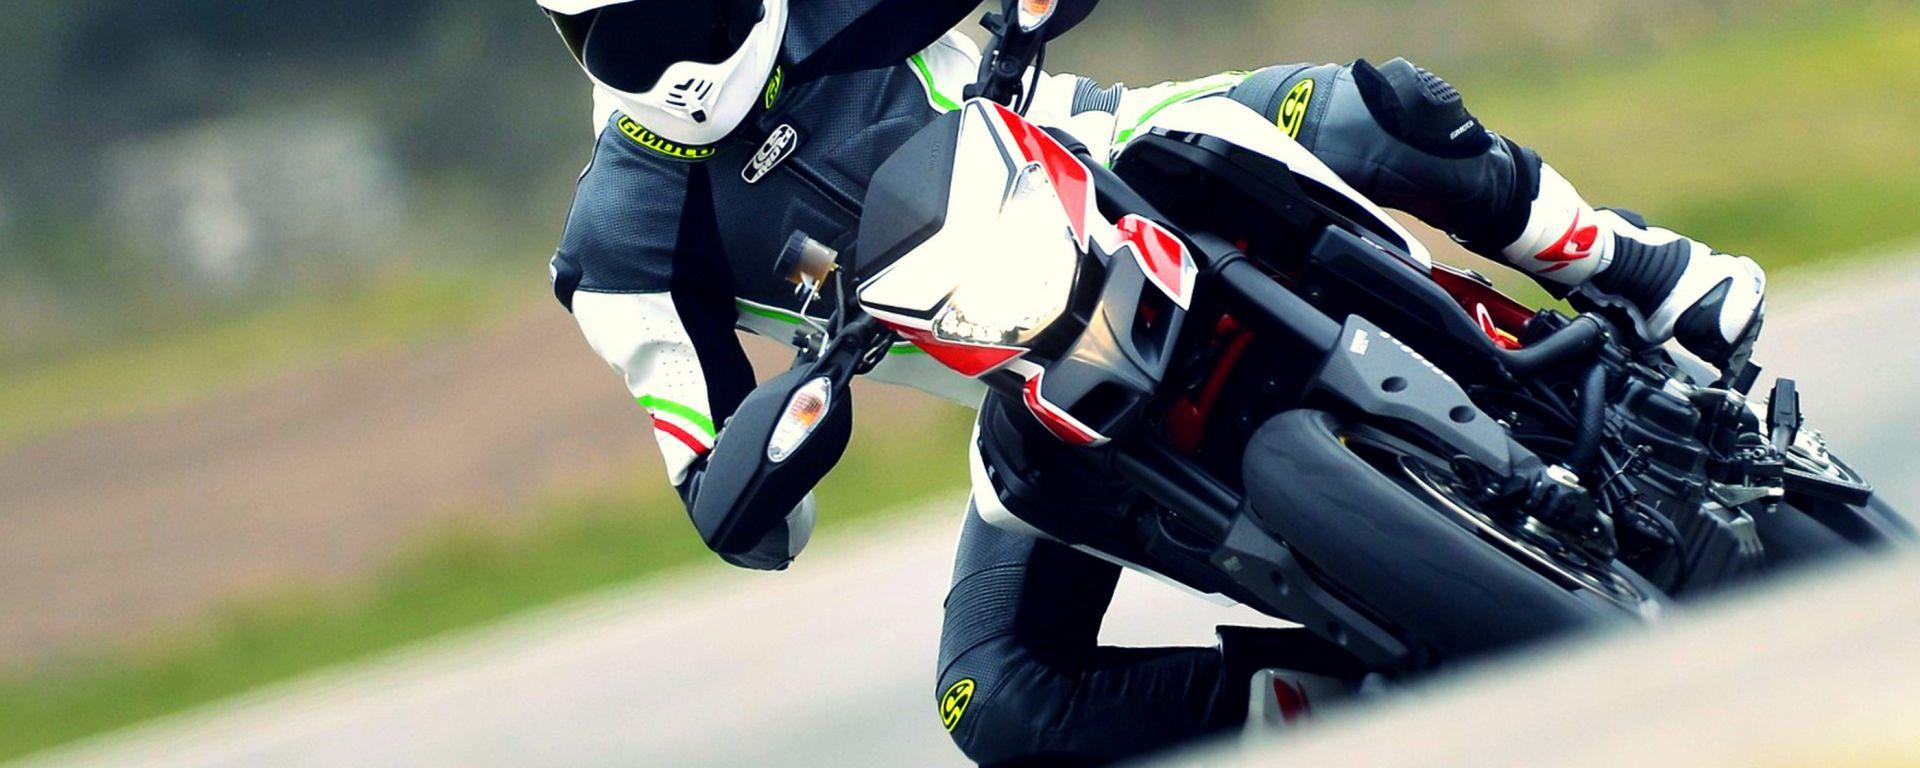 Ducati Hypermotard MY 2013